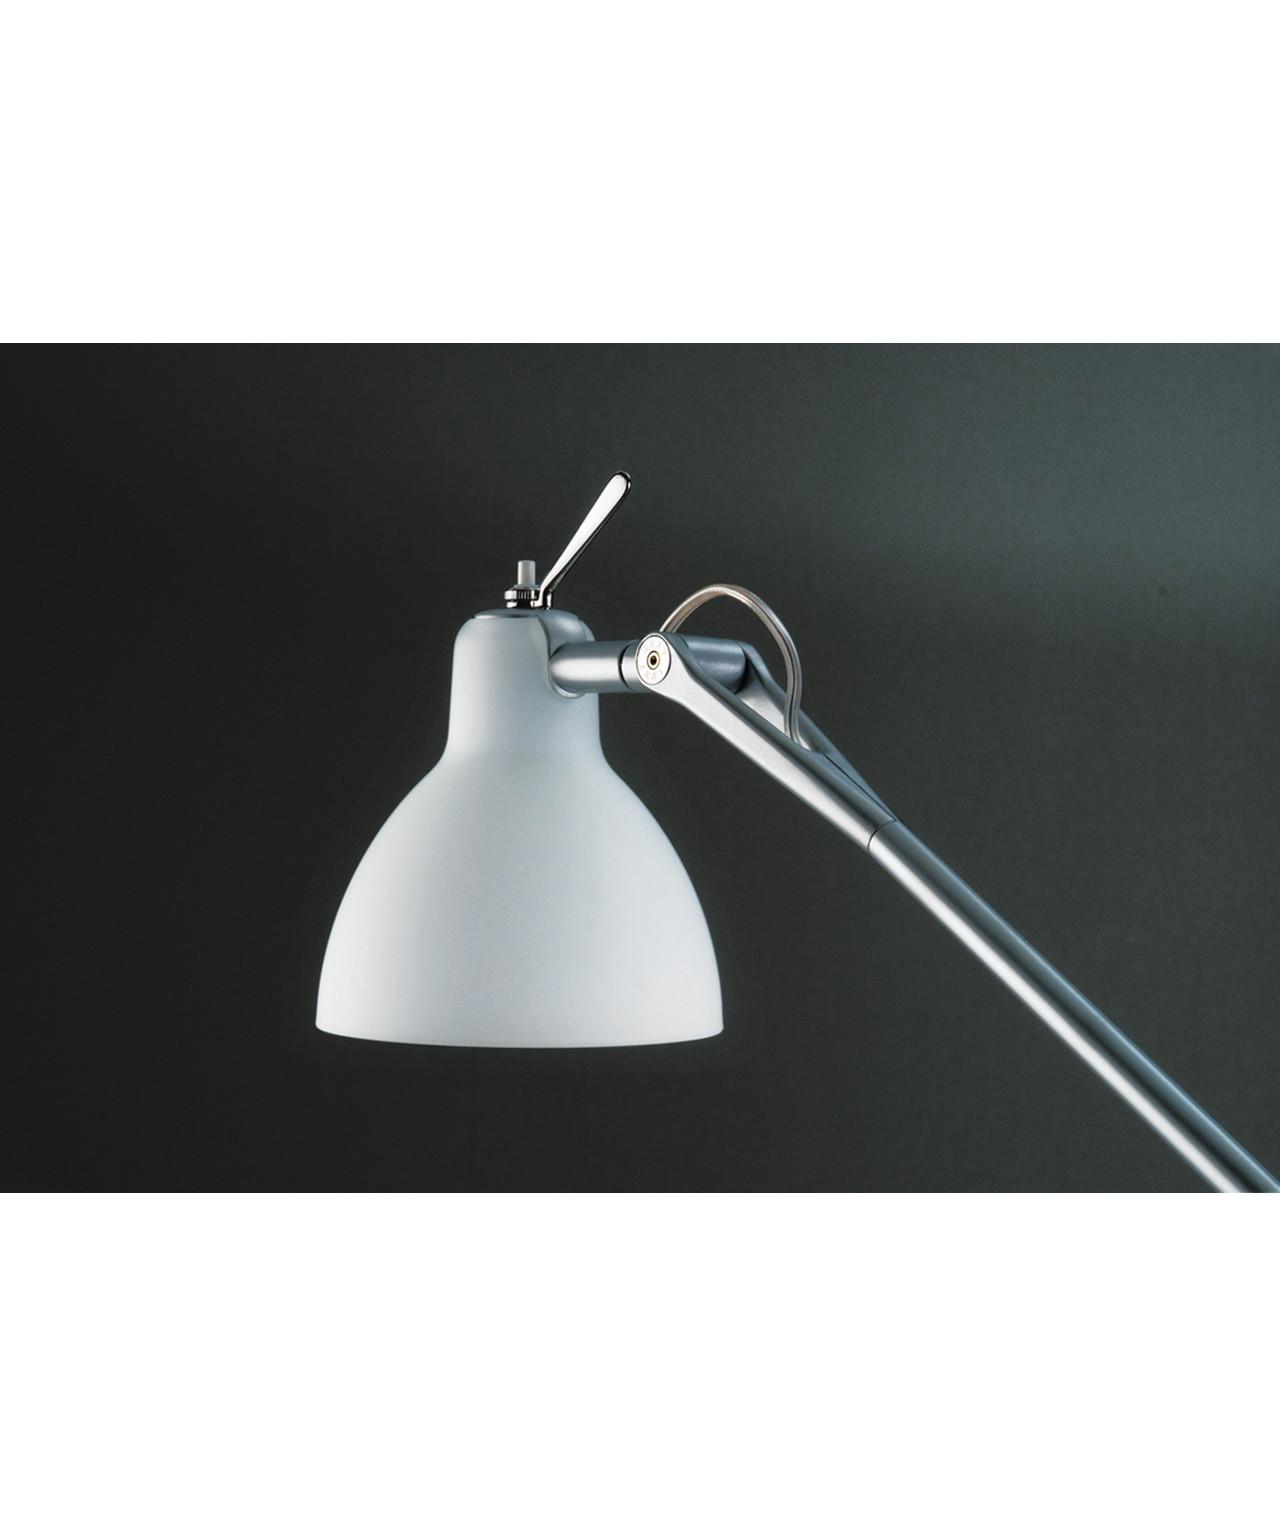 Luxy t1 bordlampe hvid/sort